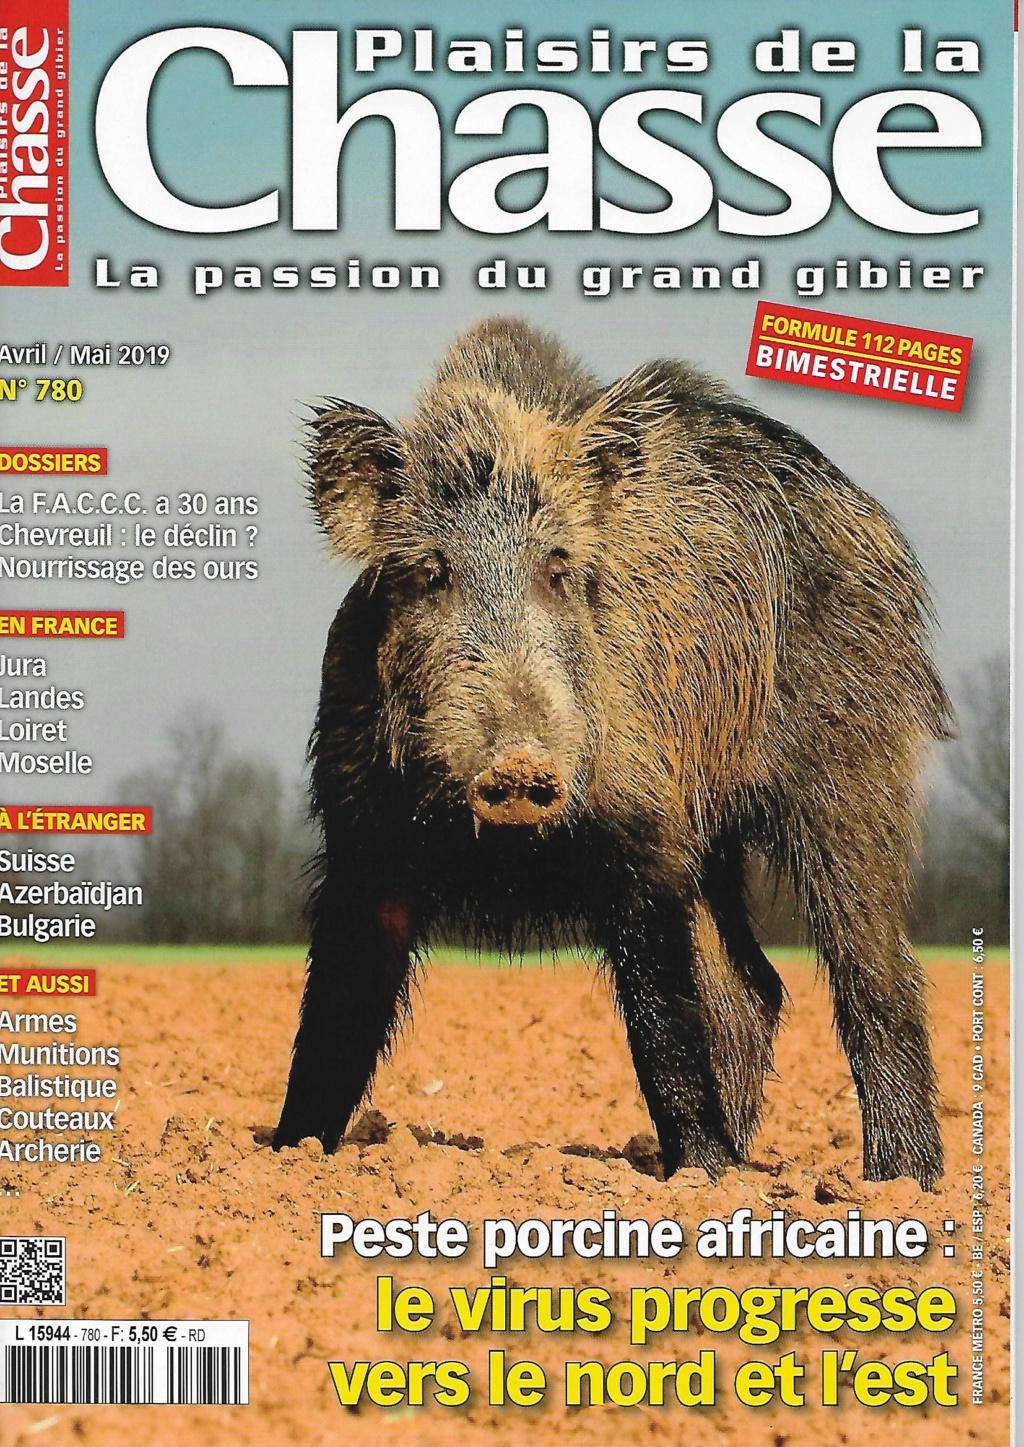 Peste porcine : On est en plein dedans !!! (Partie 2) - Page 40 Scan_116